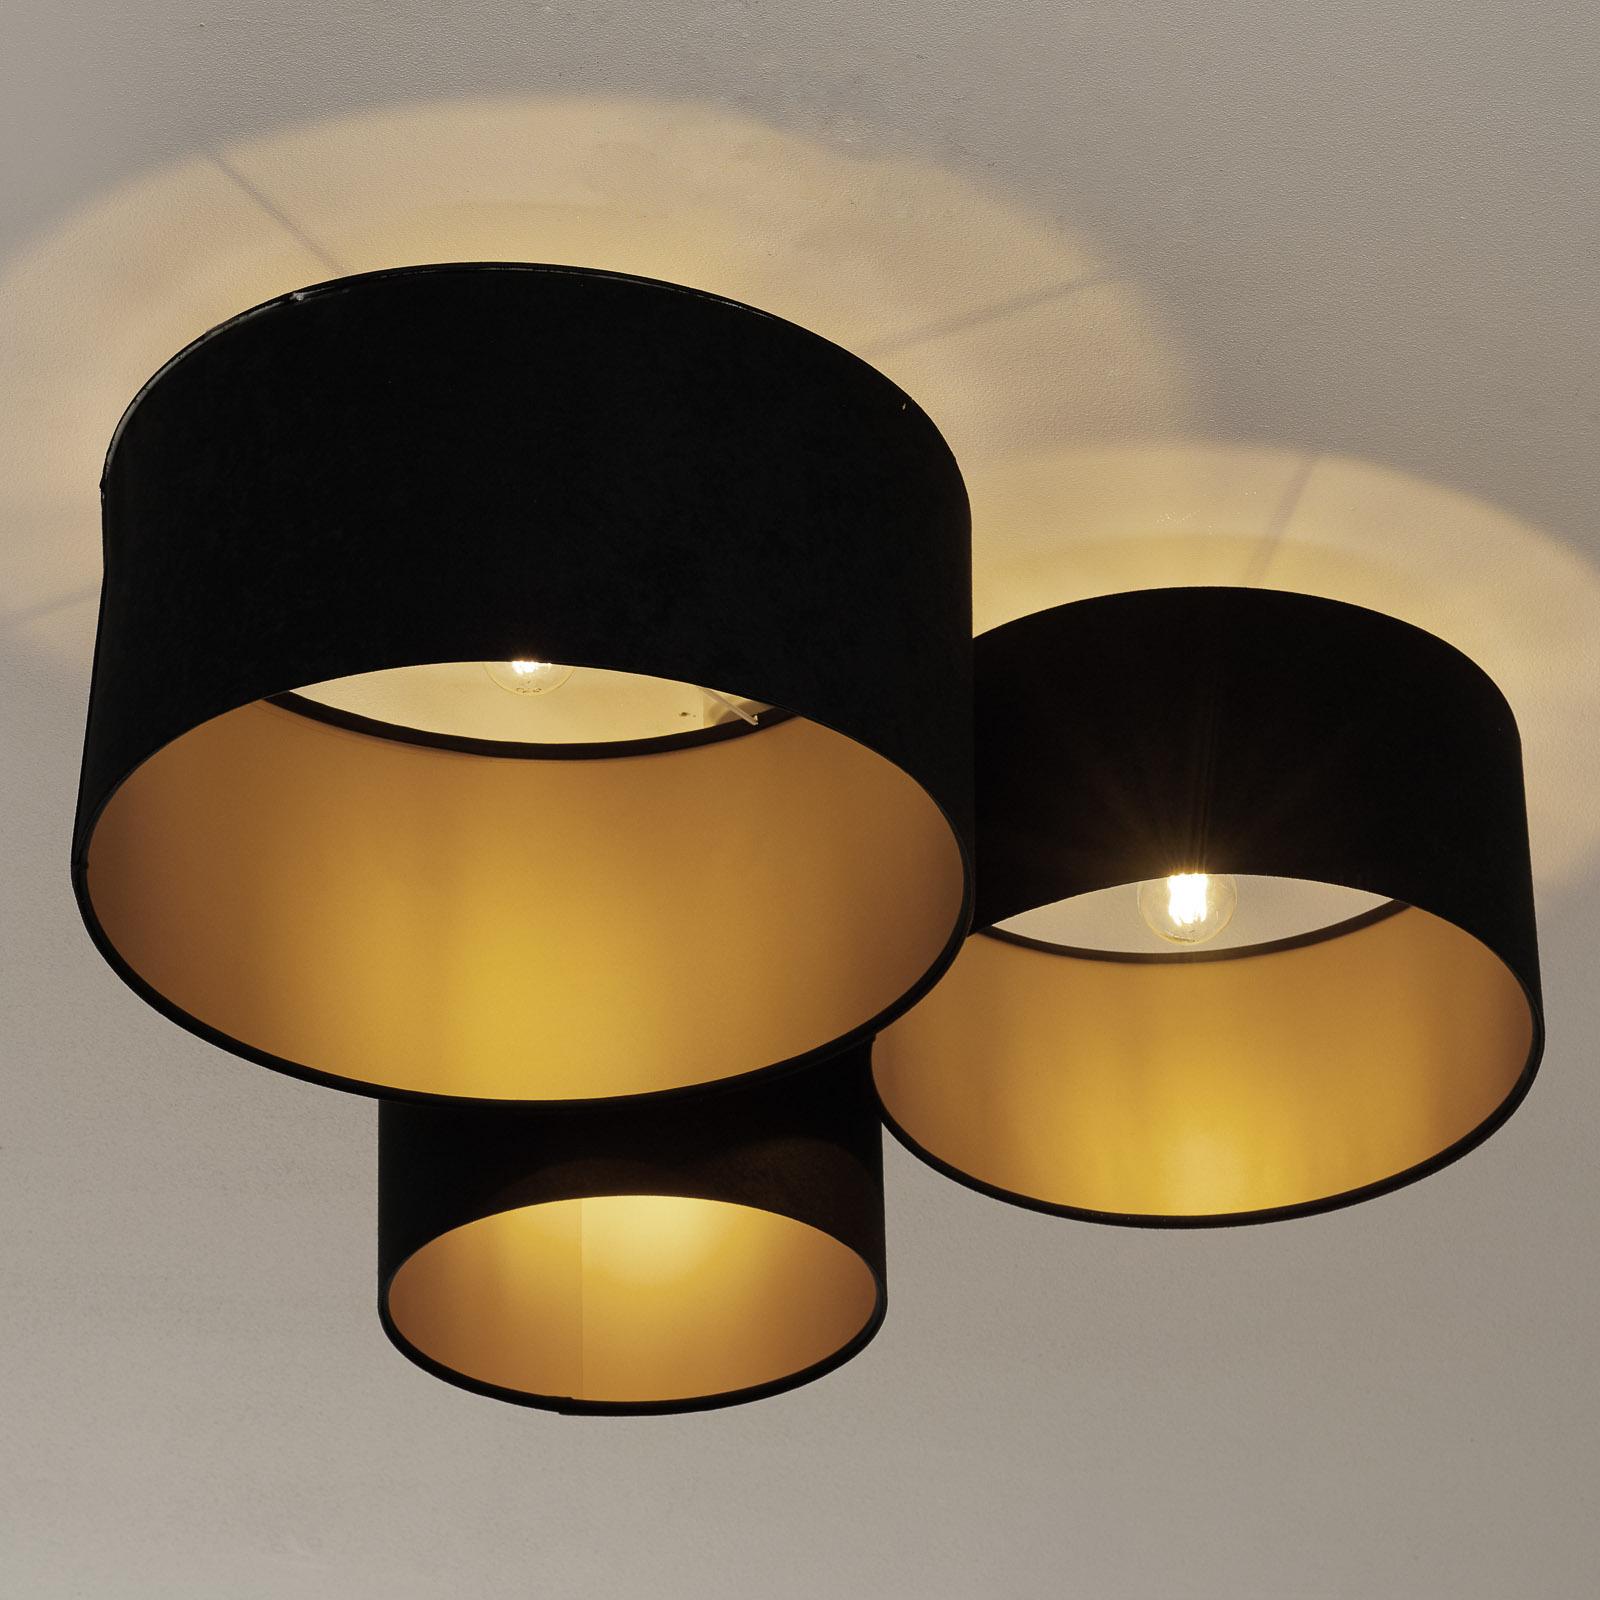 Loftlampe 080, 3 lyskilder, sort-guld